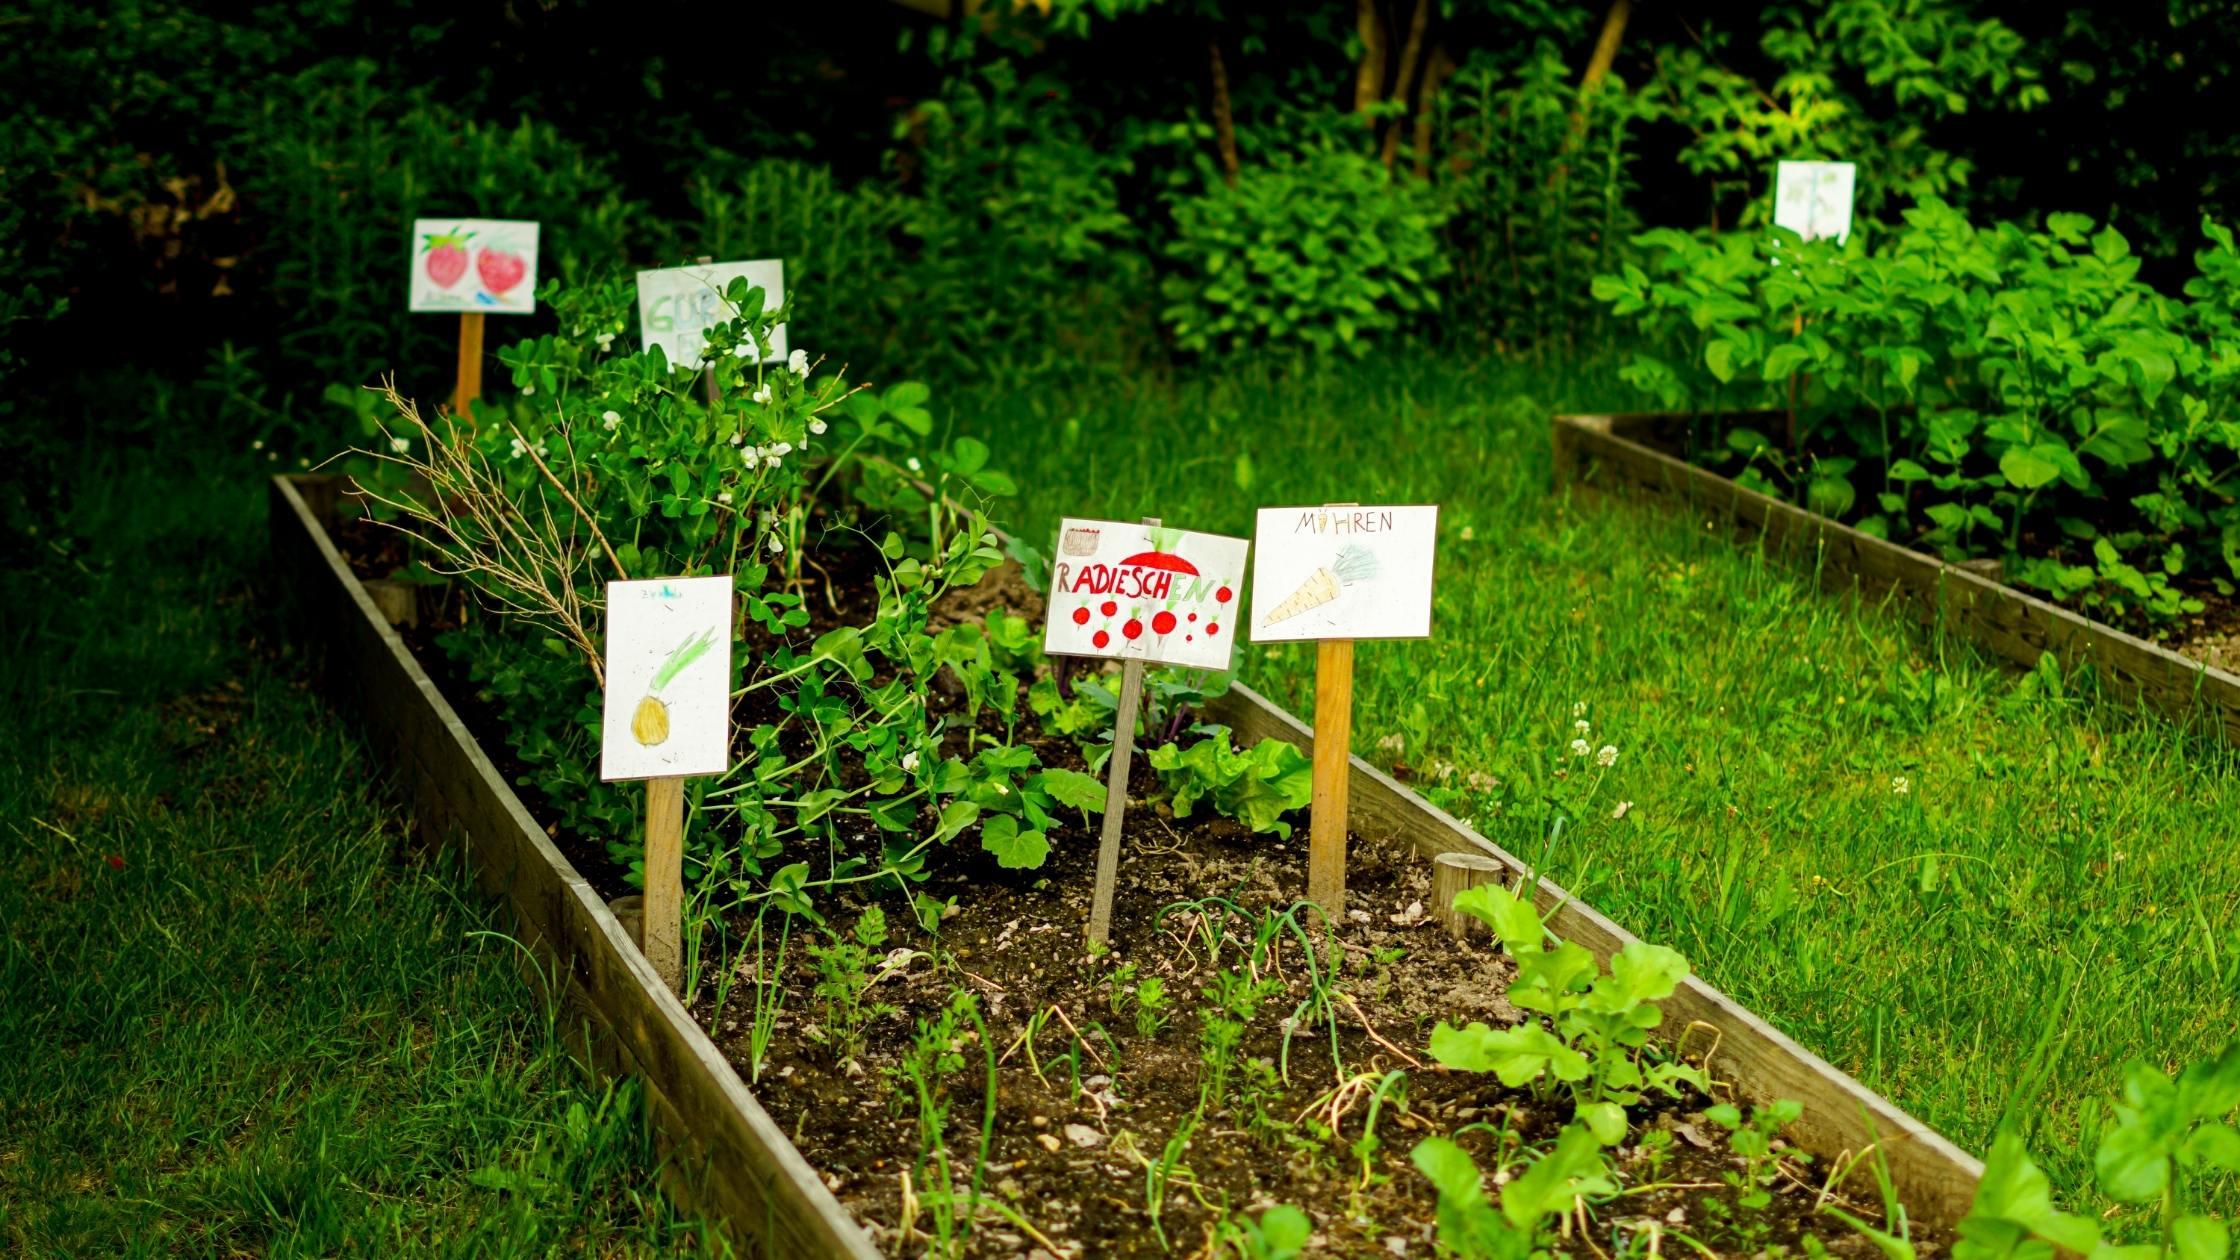 School Gardens Inspire Food Justice and Environmental Activism